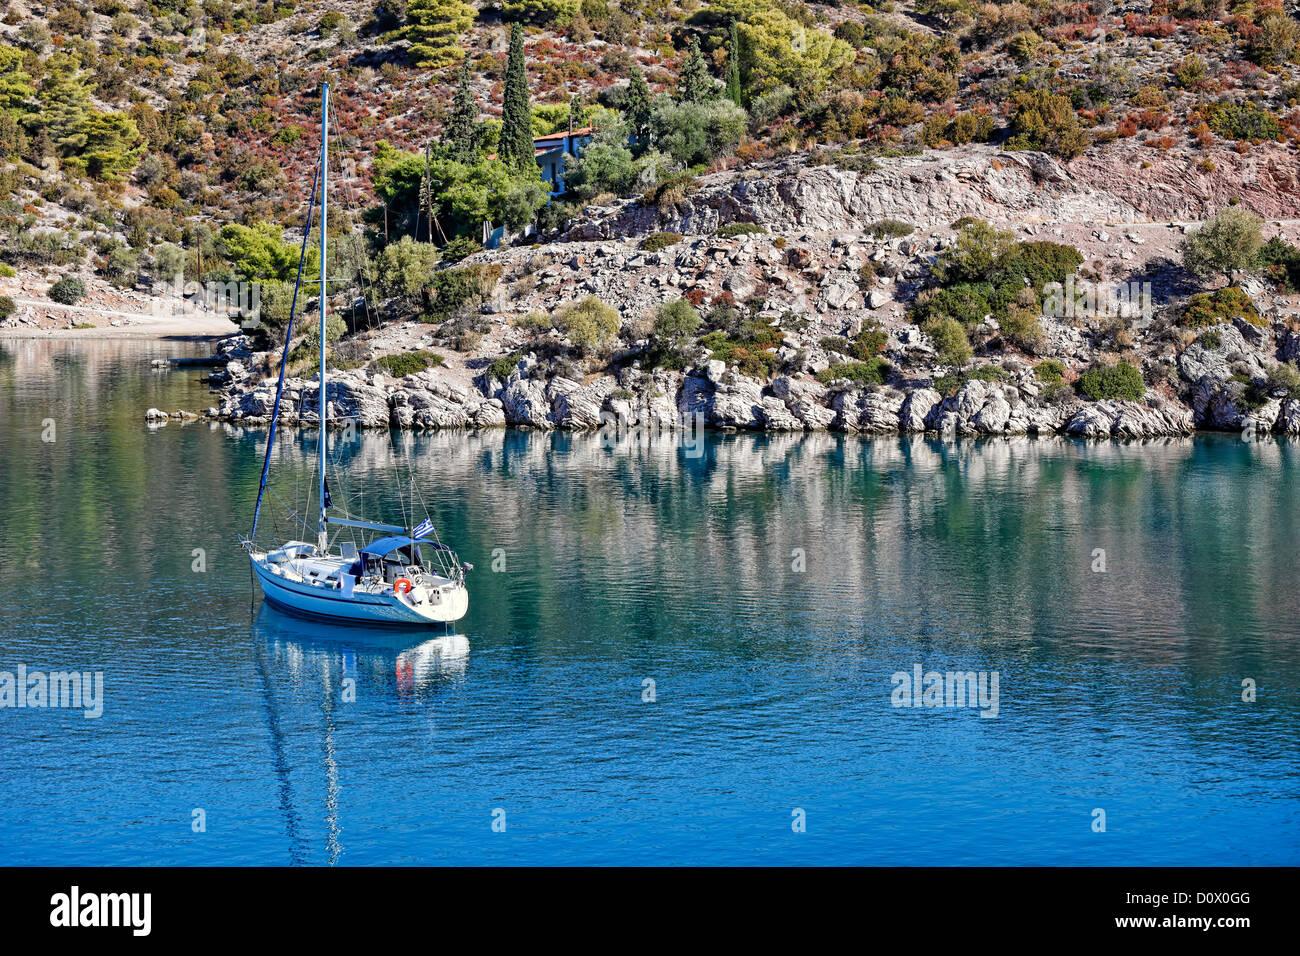 A yacht in Poros island, Greece - Stock Image